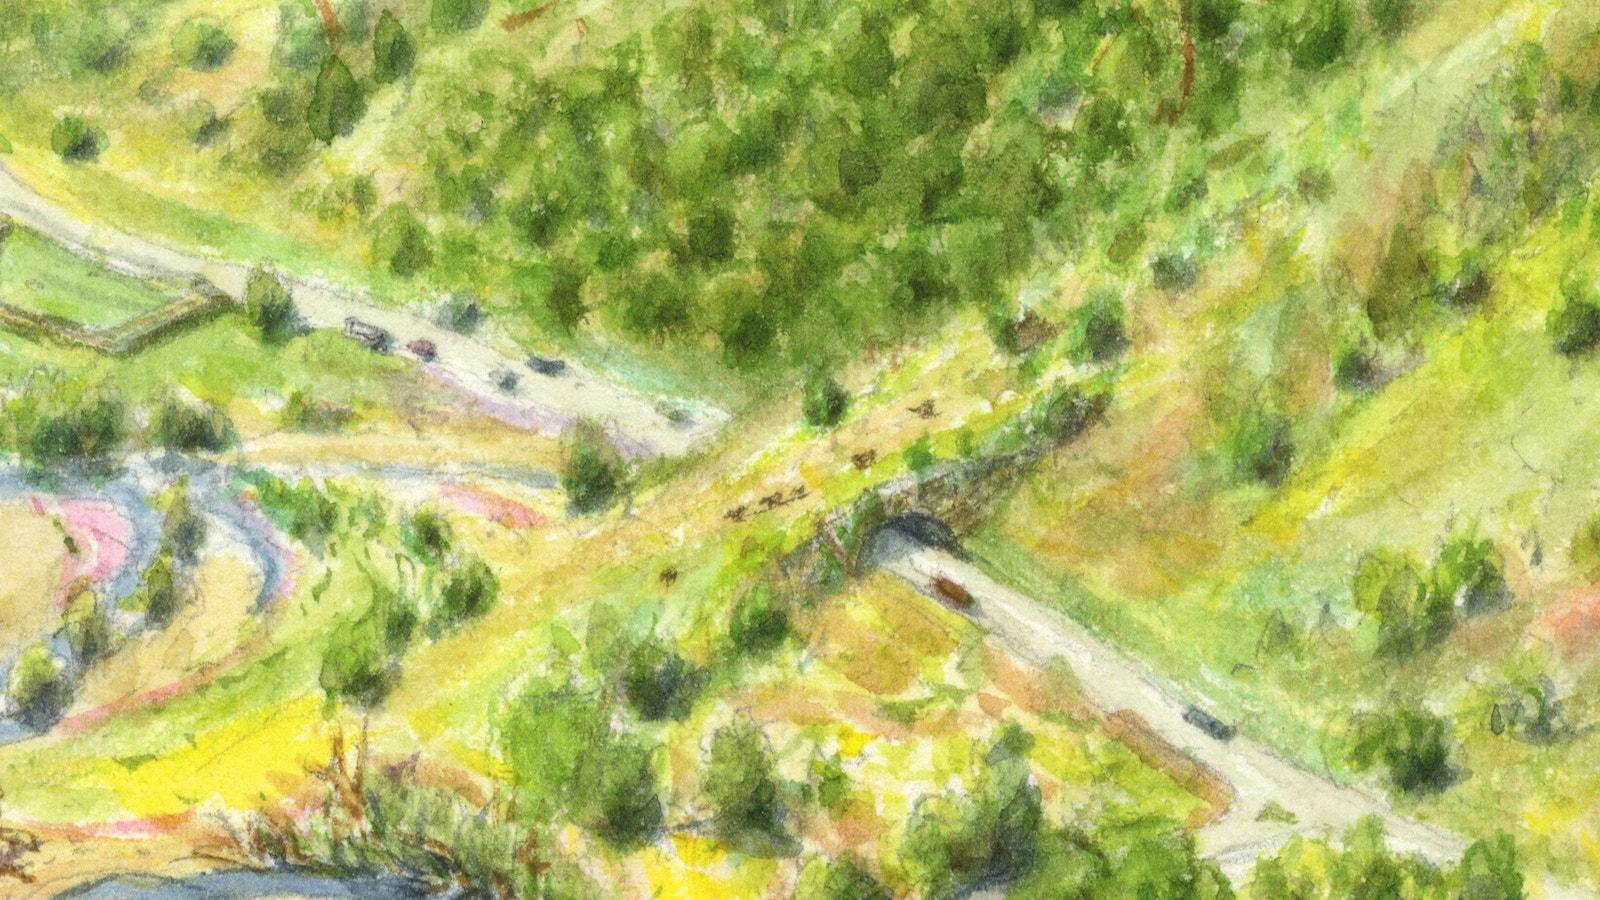 Uplands future wildbridge